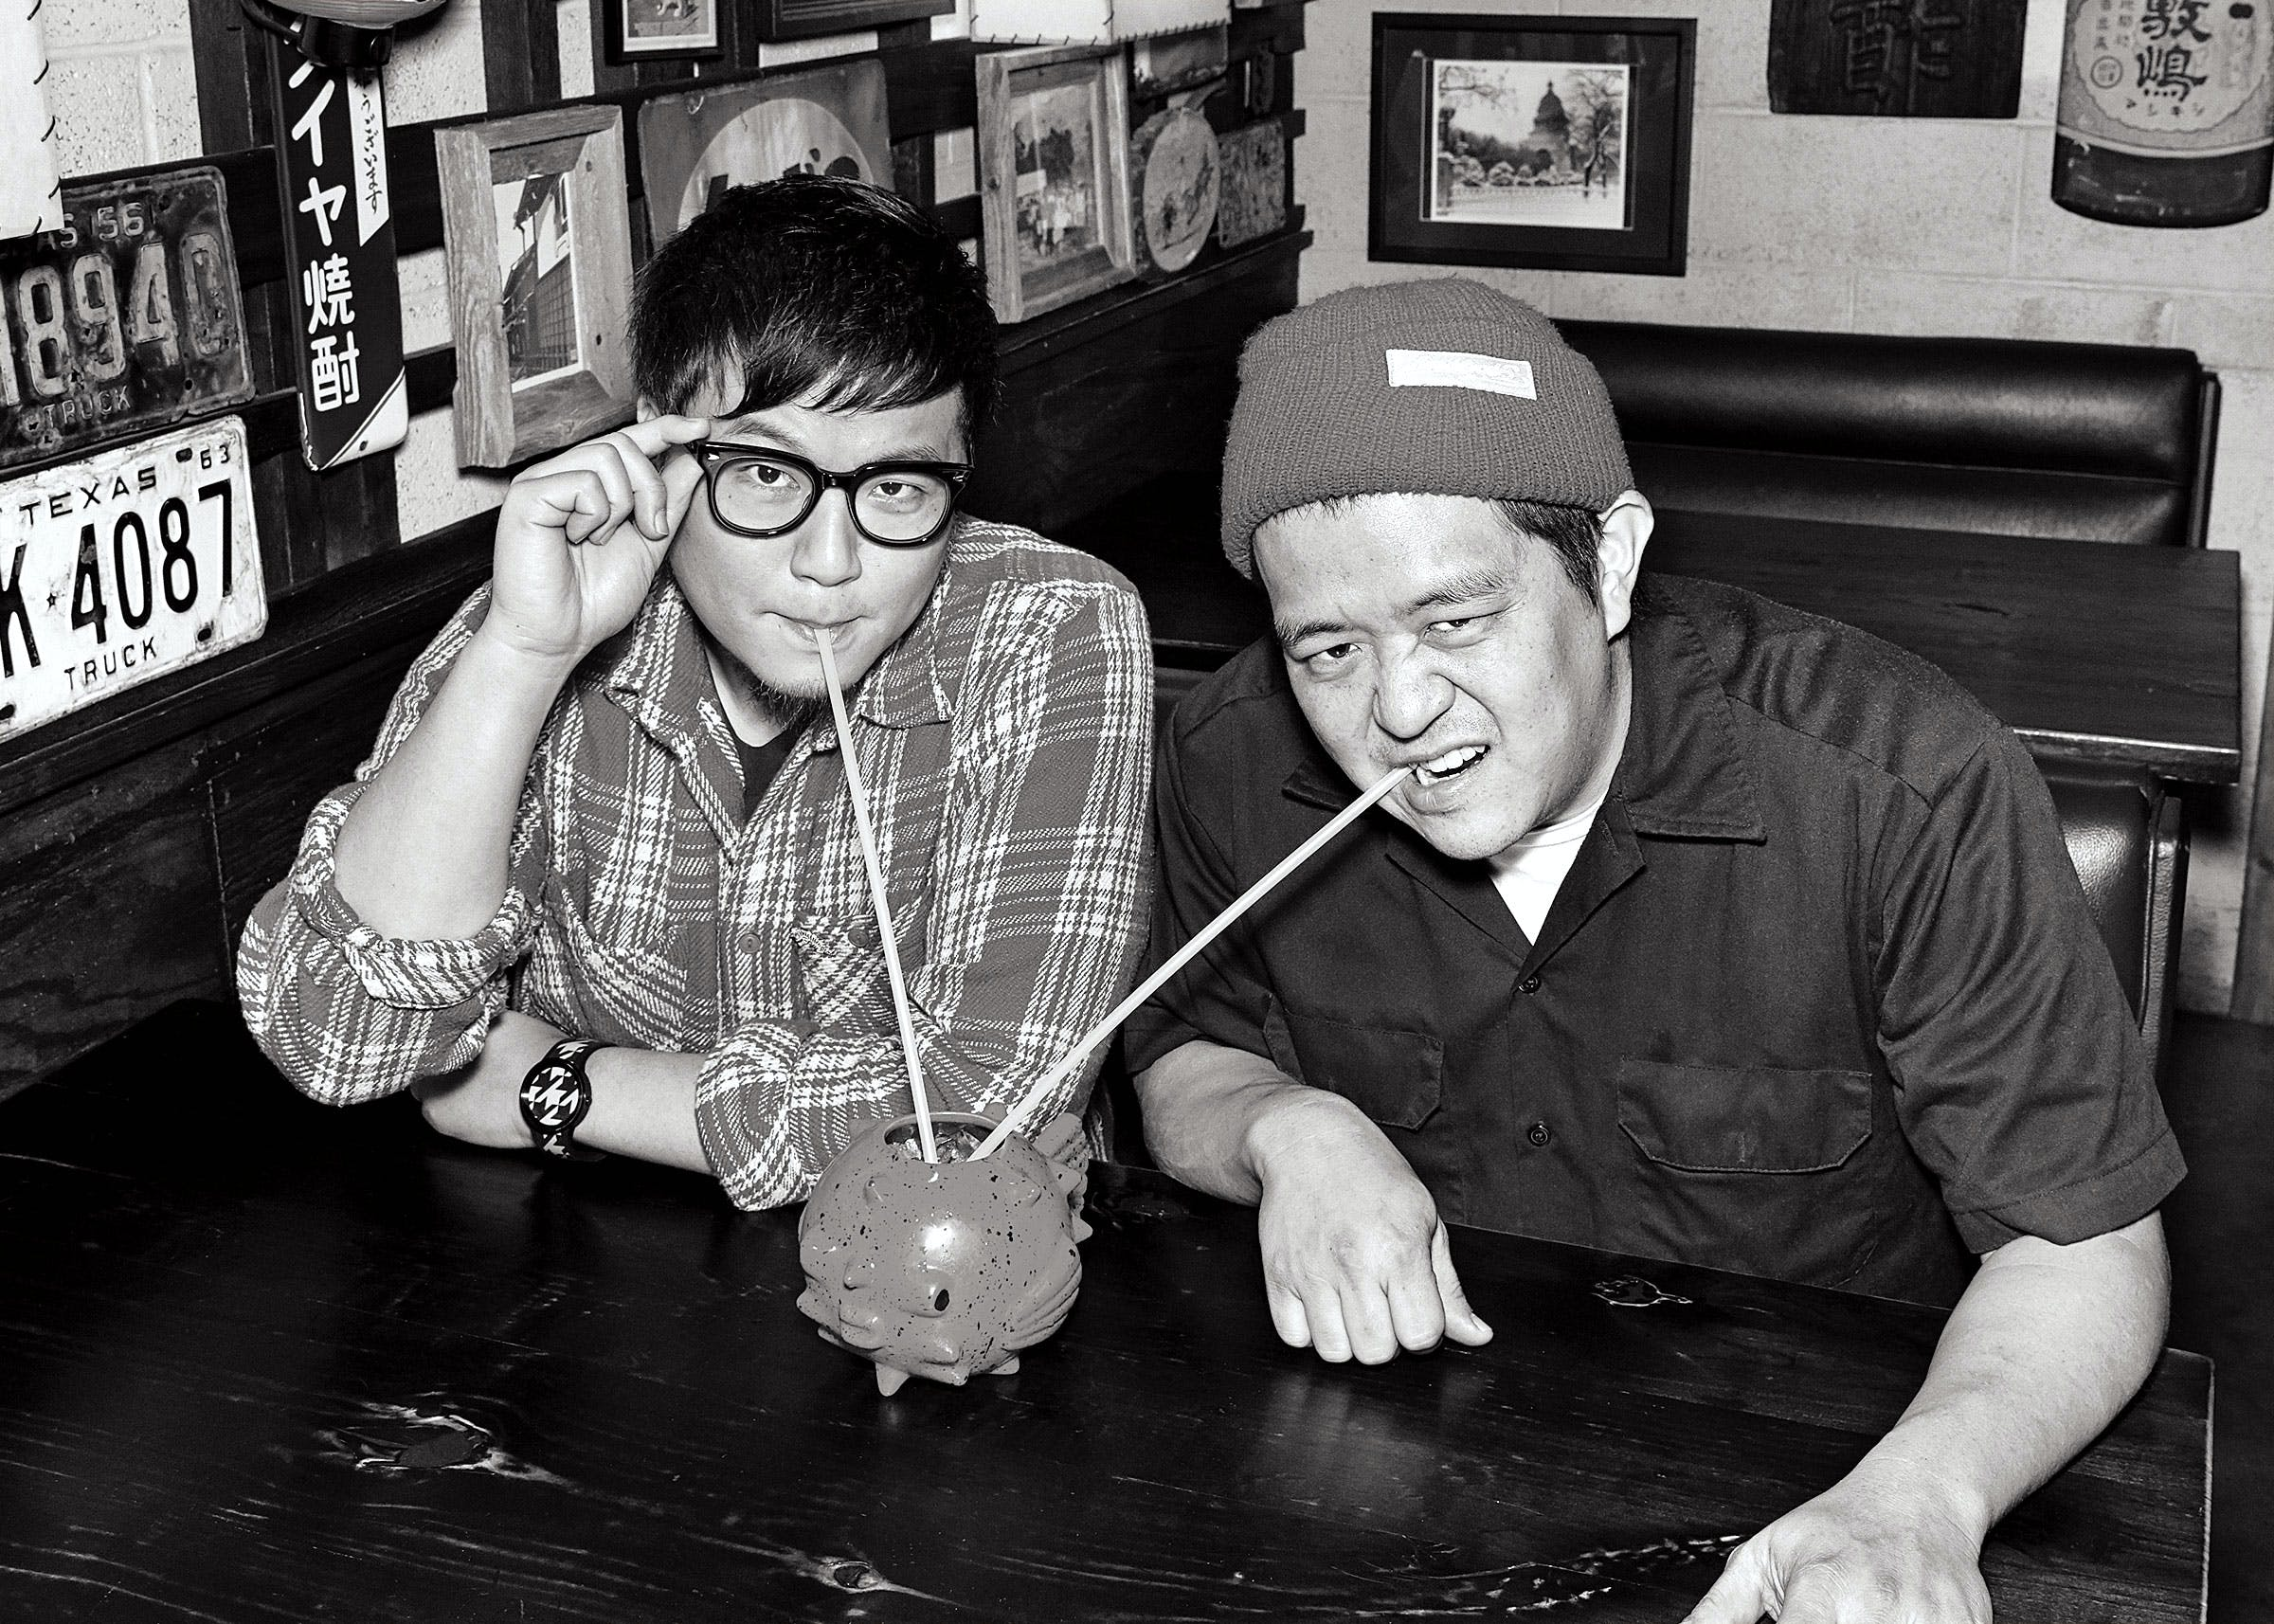 Kemuri Aikawa and Matsumoto